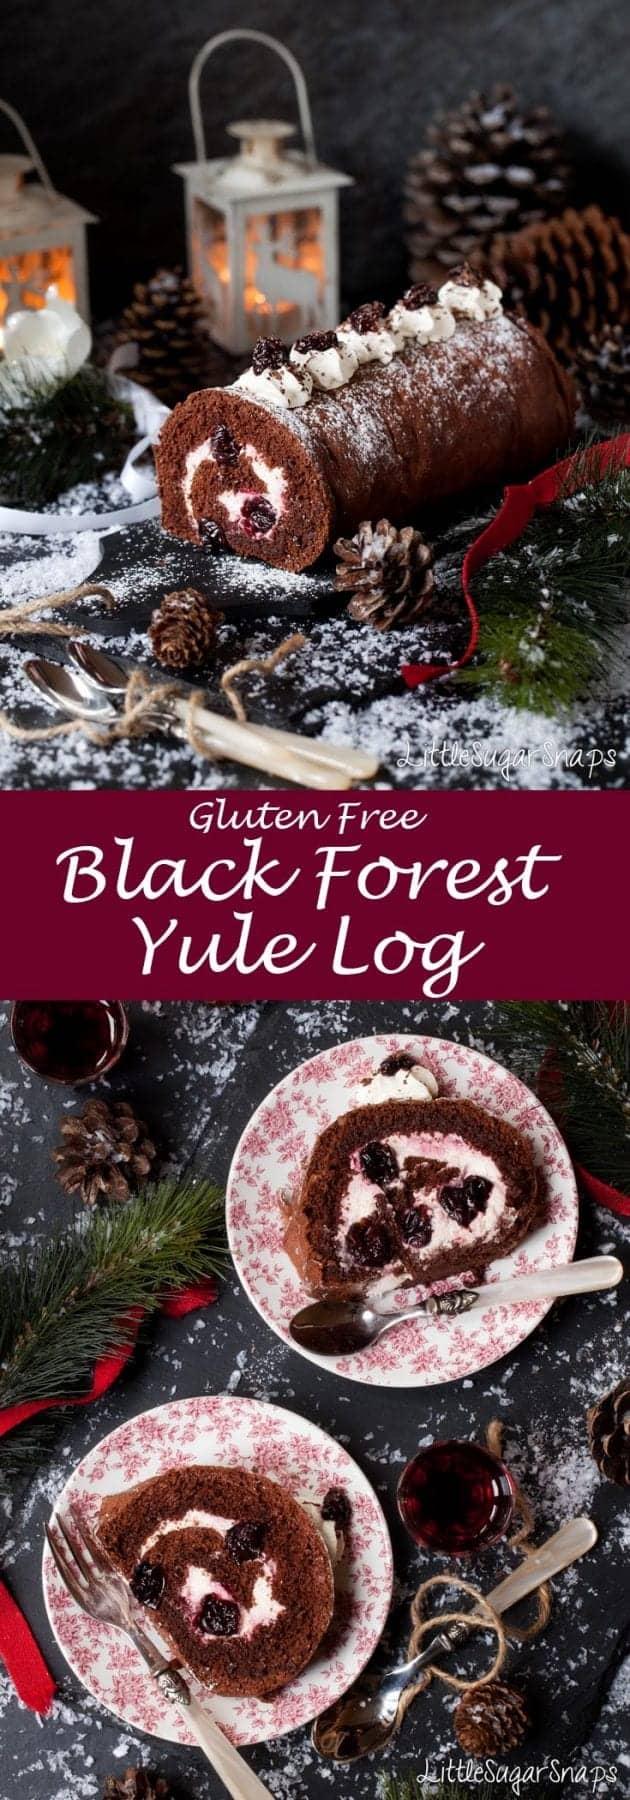 Black Forest Yule Log #blackforest #yulelog #yule #buchedenoel #blackforestgateau